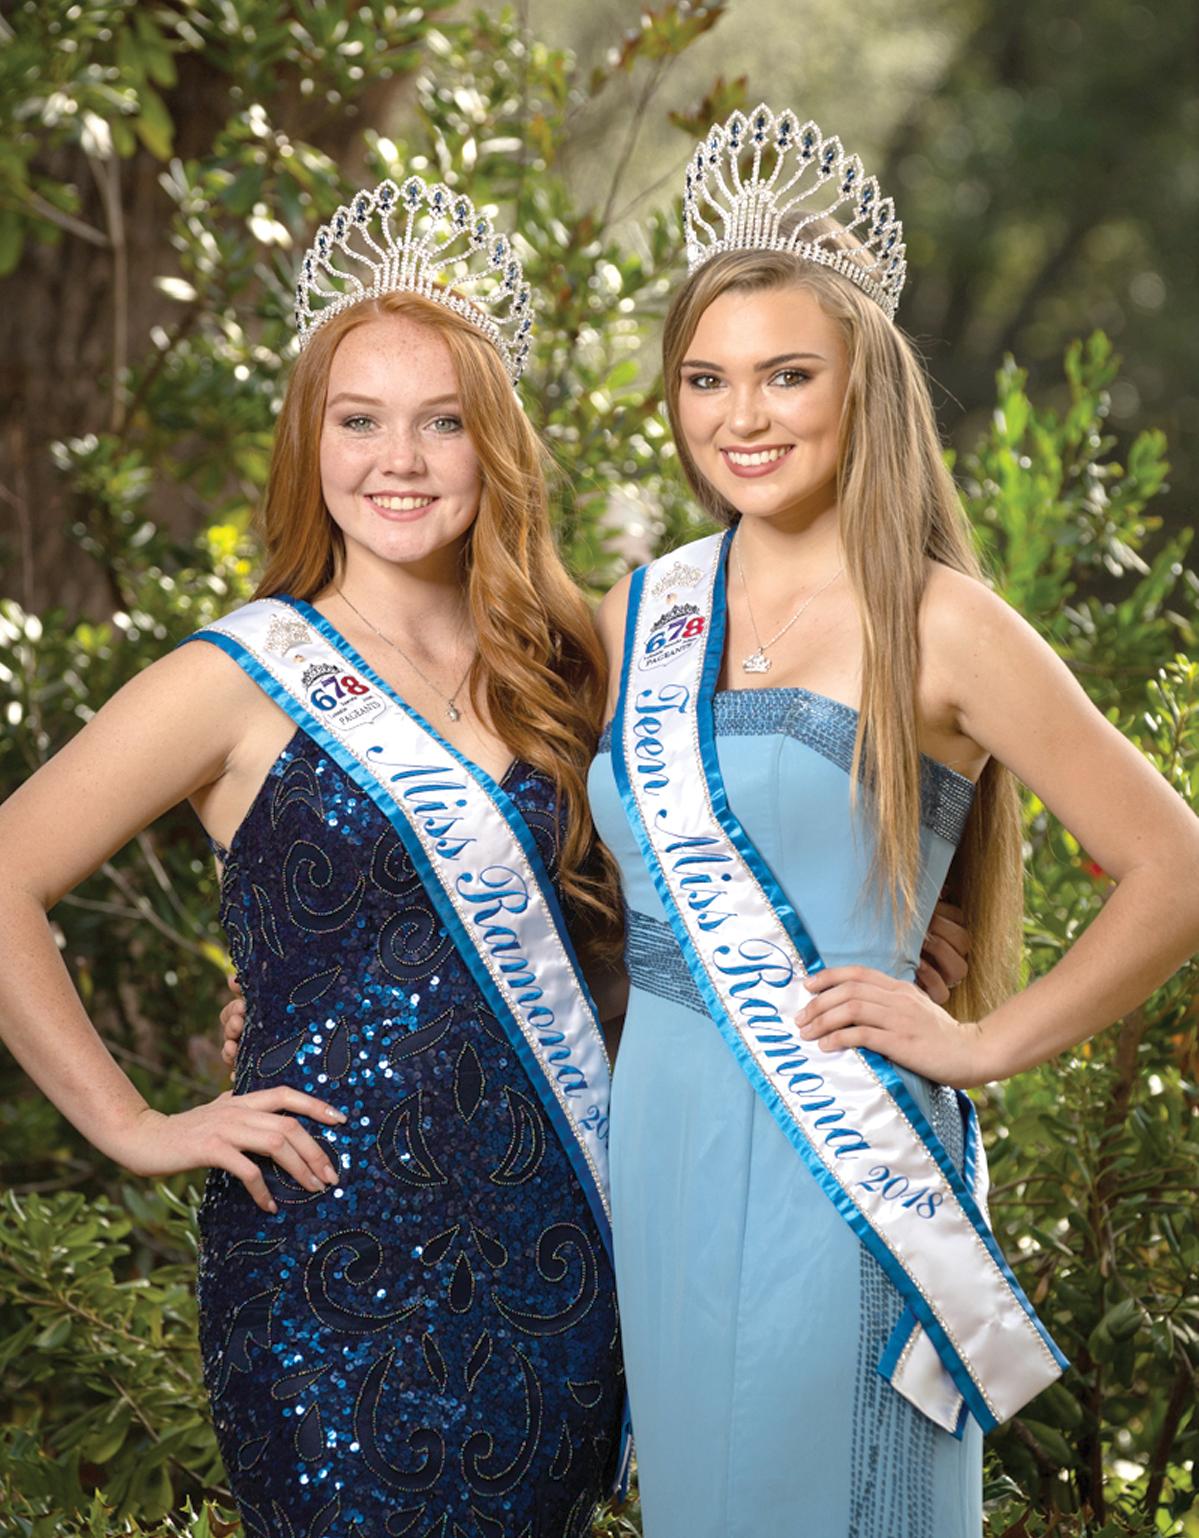 Miss Ramona 2018 Megan Kelly, left, and Teen Miss Ramona 2018 Makenna Hyland.   Photo by Rob Riingen Photography